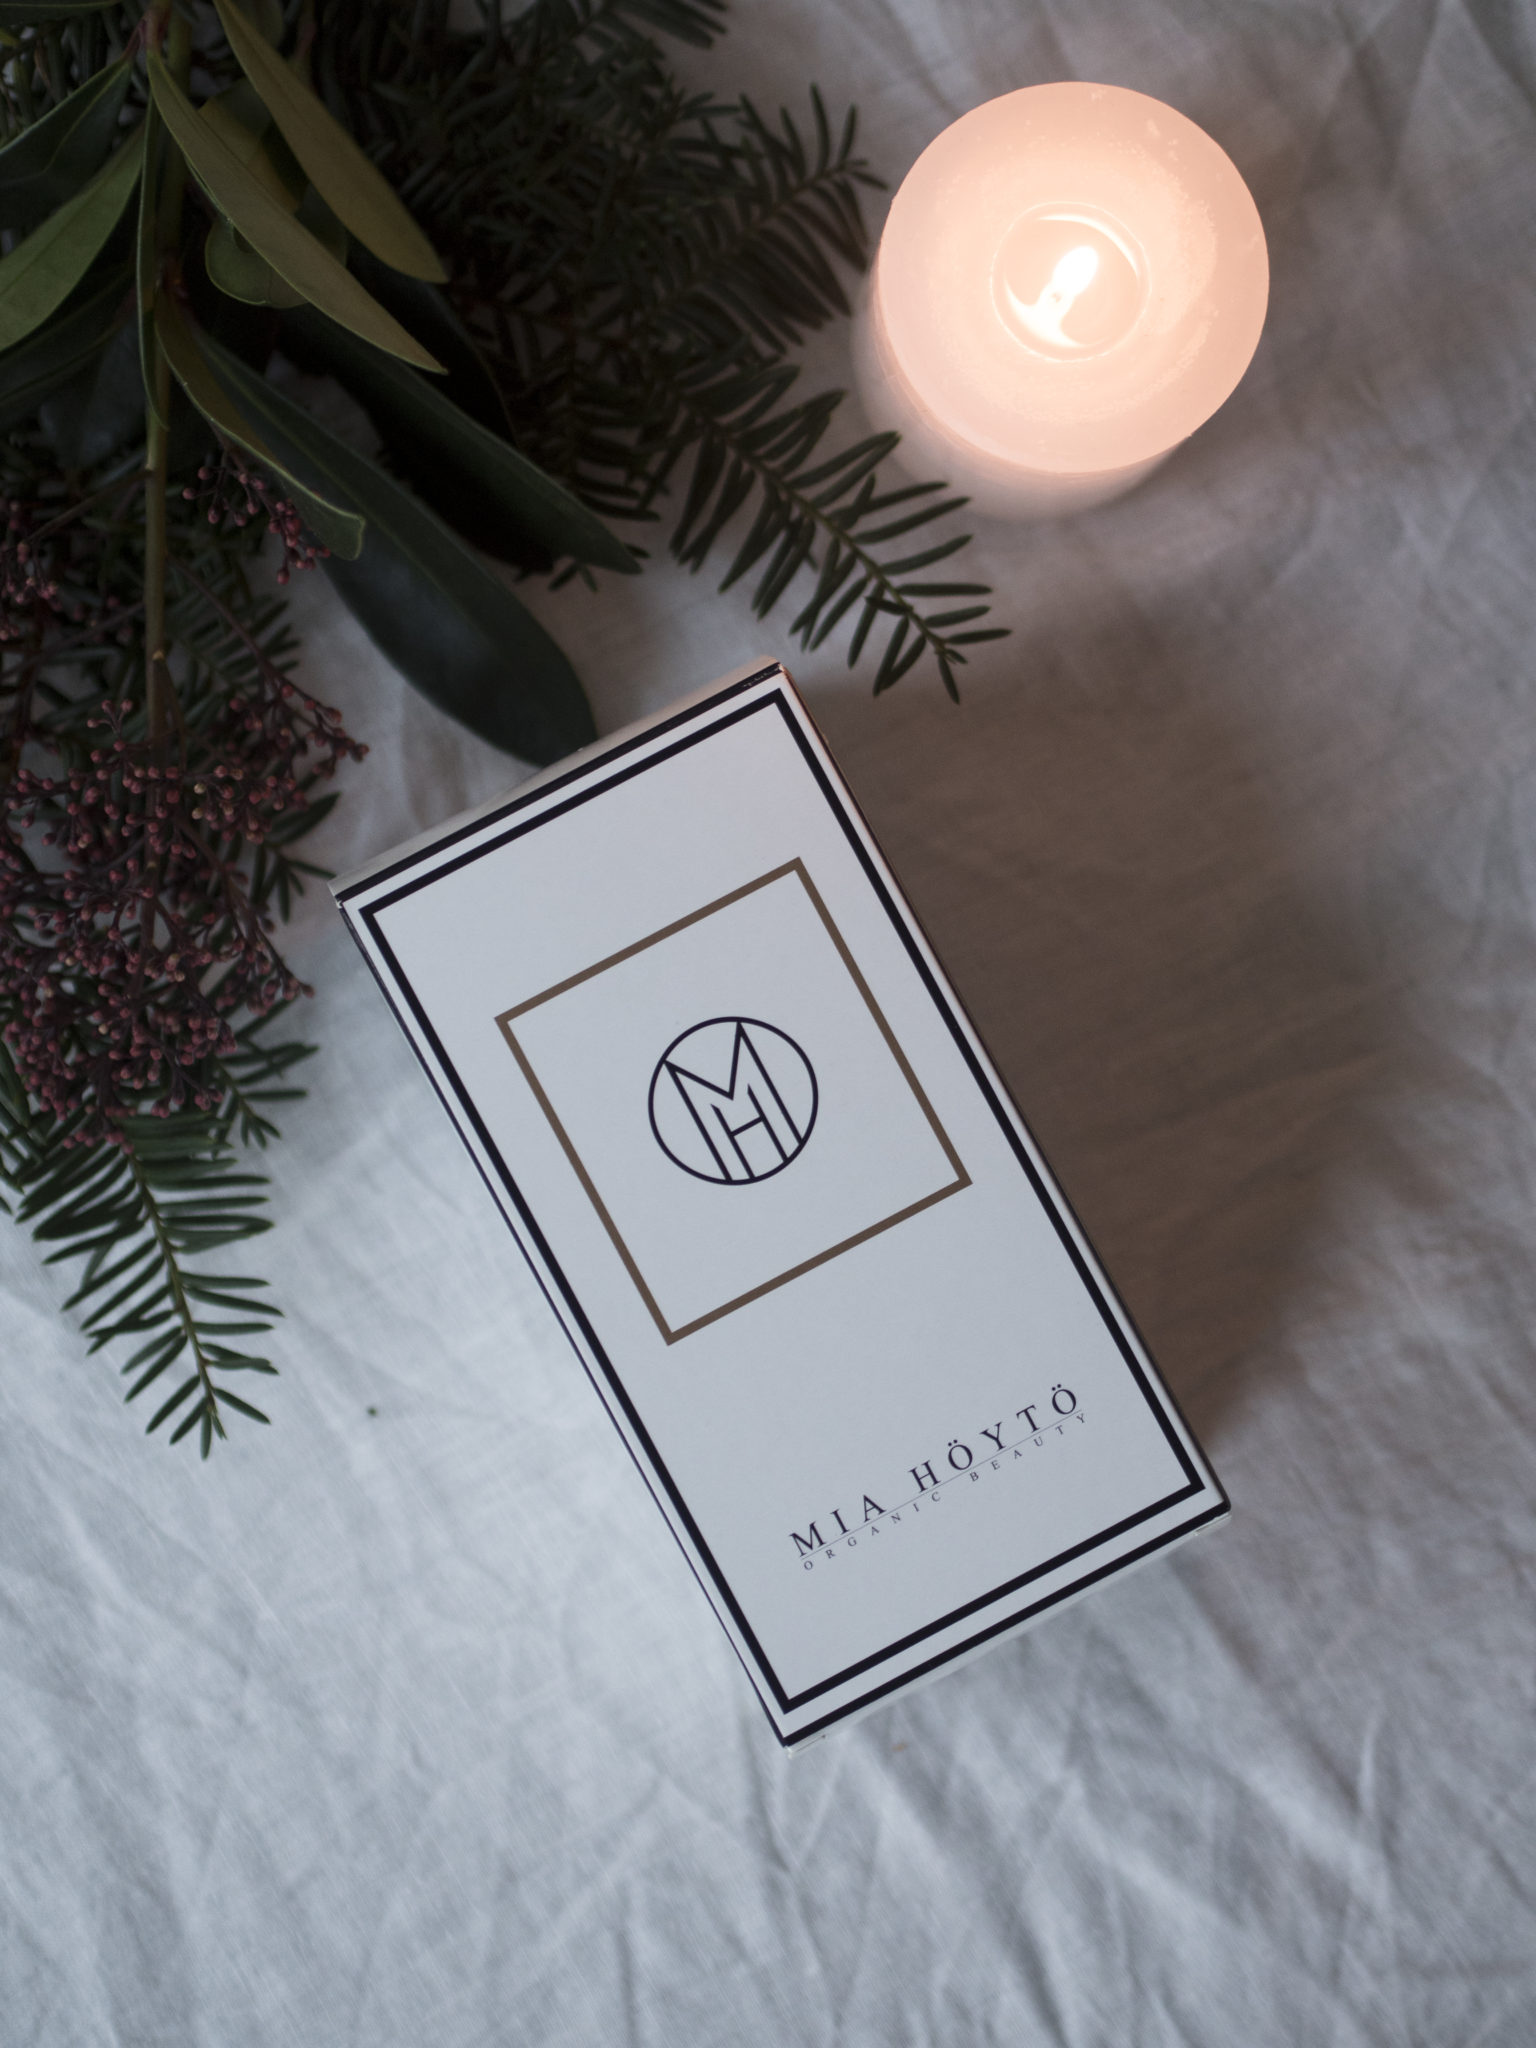 Mia Hoyto Cosmetics joulupaketti